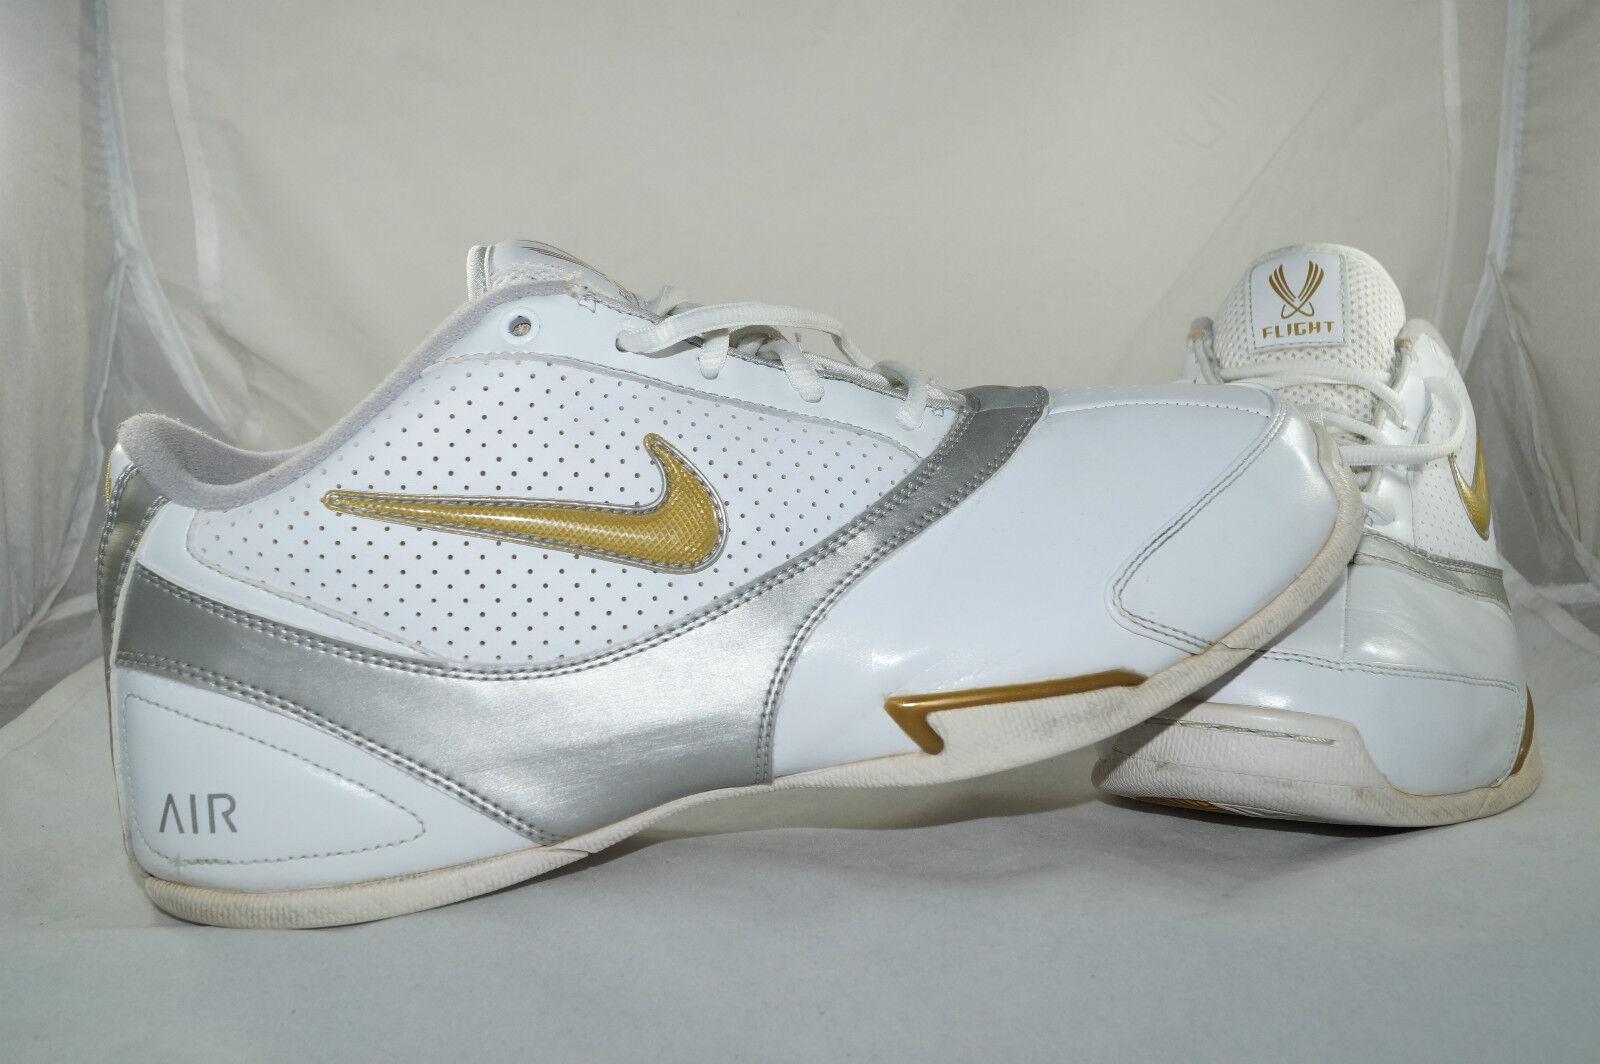 Nike Air FLIGHT LIFTOFF Low Gr: 45 Low Tops Basketball